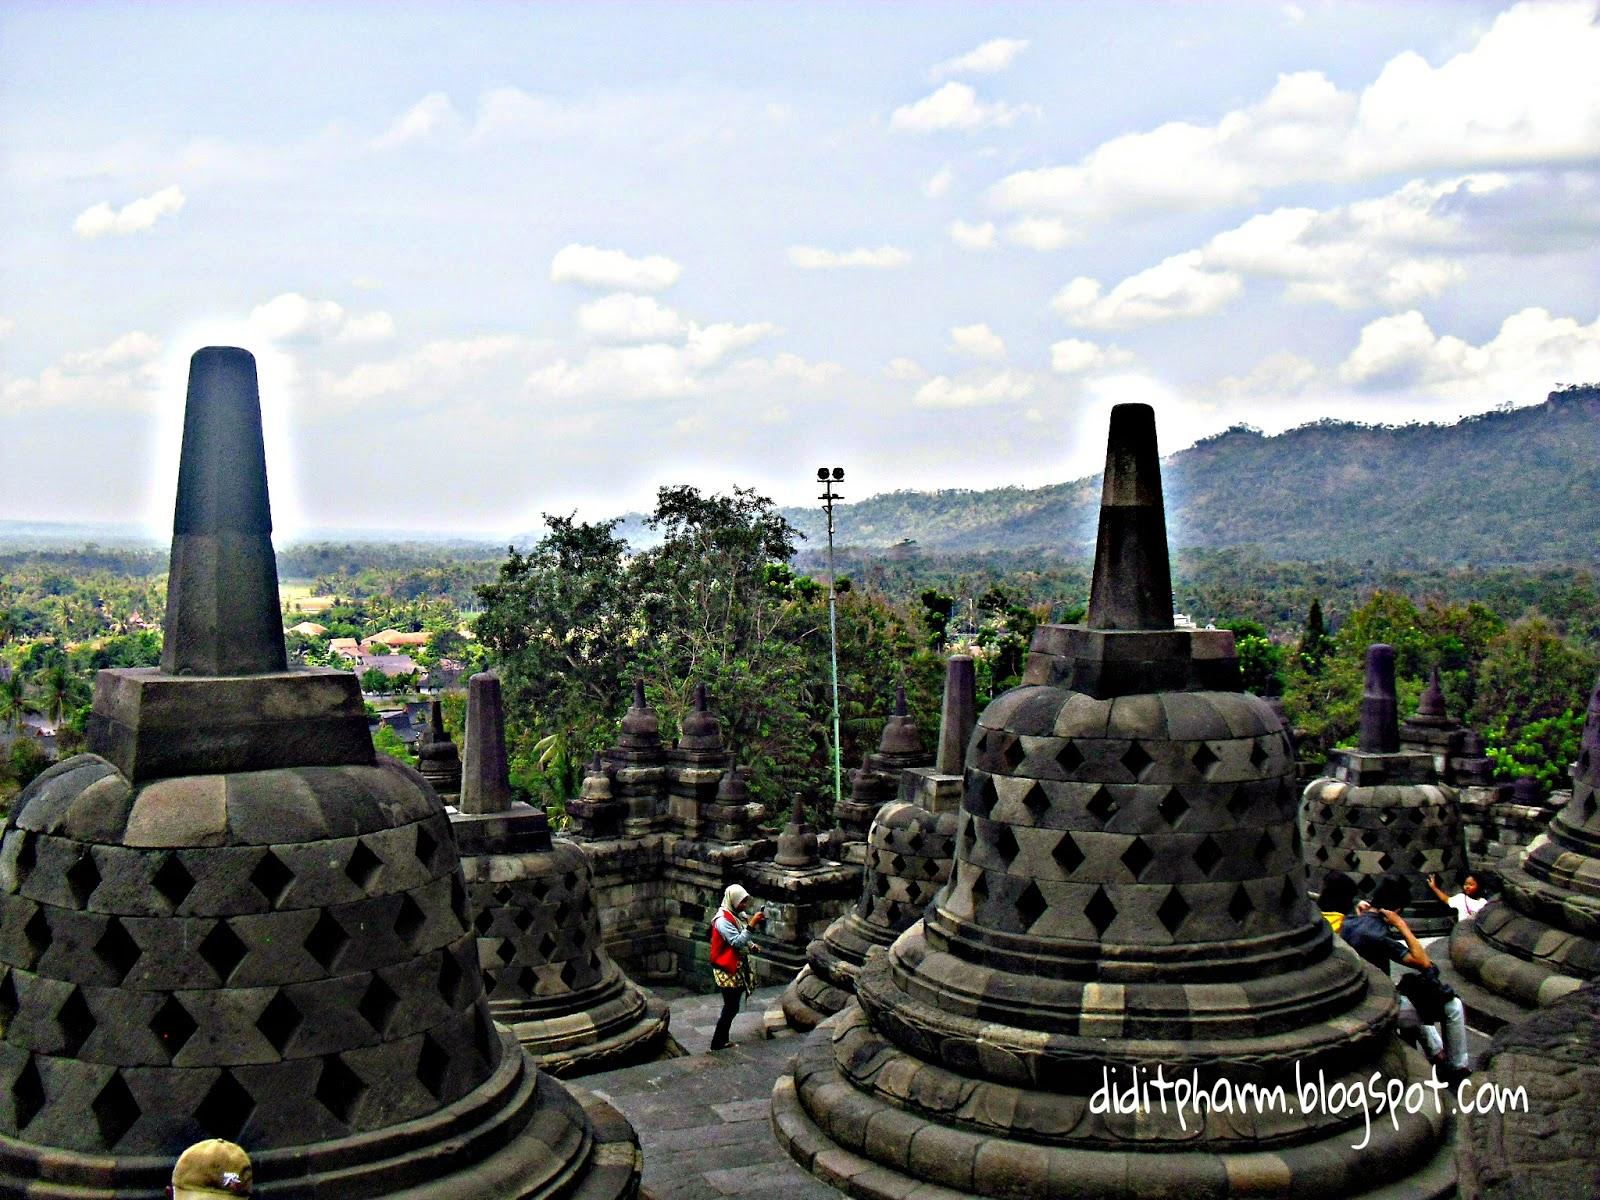 Belajar Sejarah Dari Candi Borobudur Jawa Tengah Lazwardy Journal